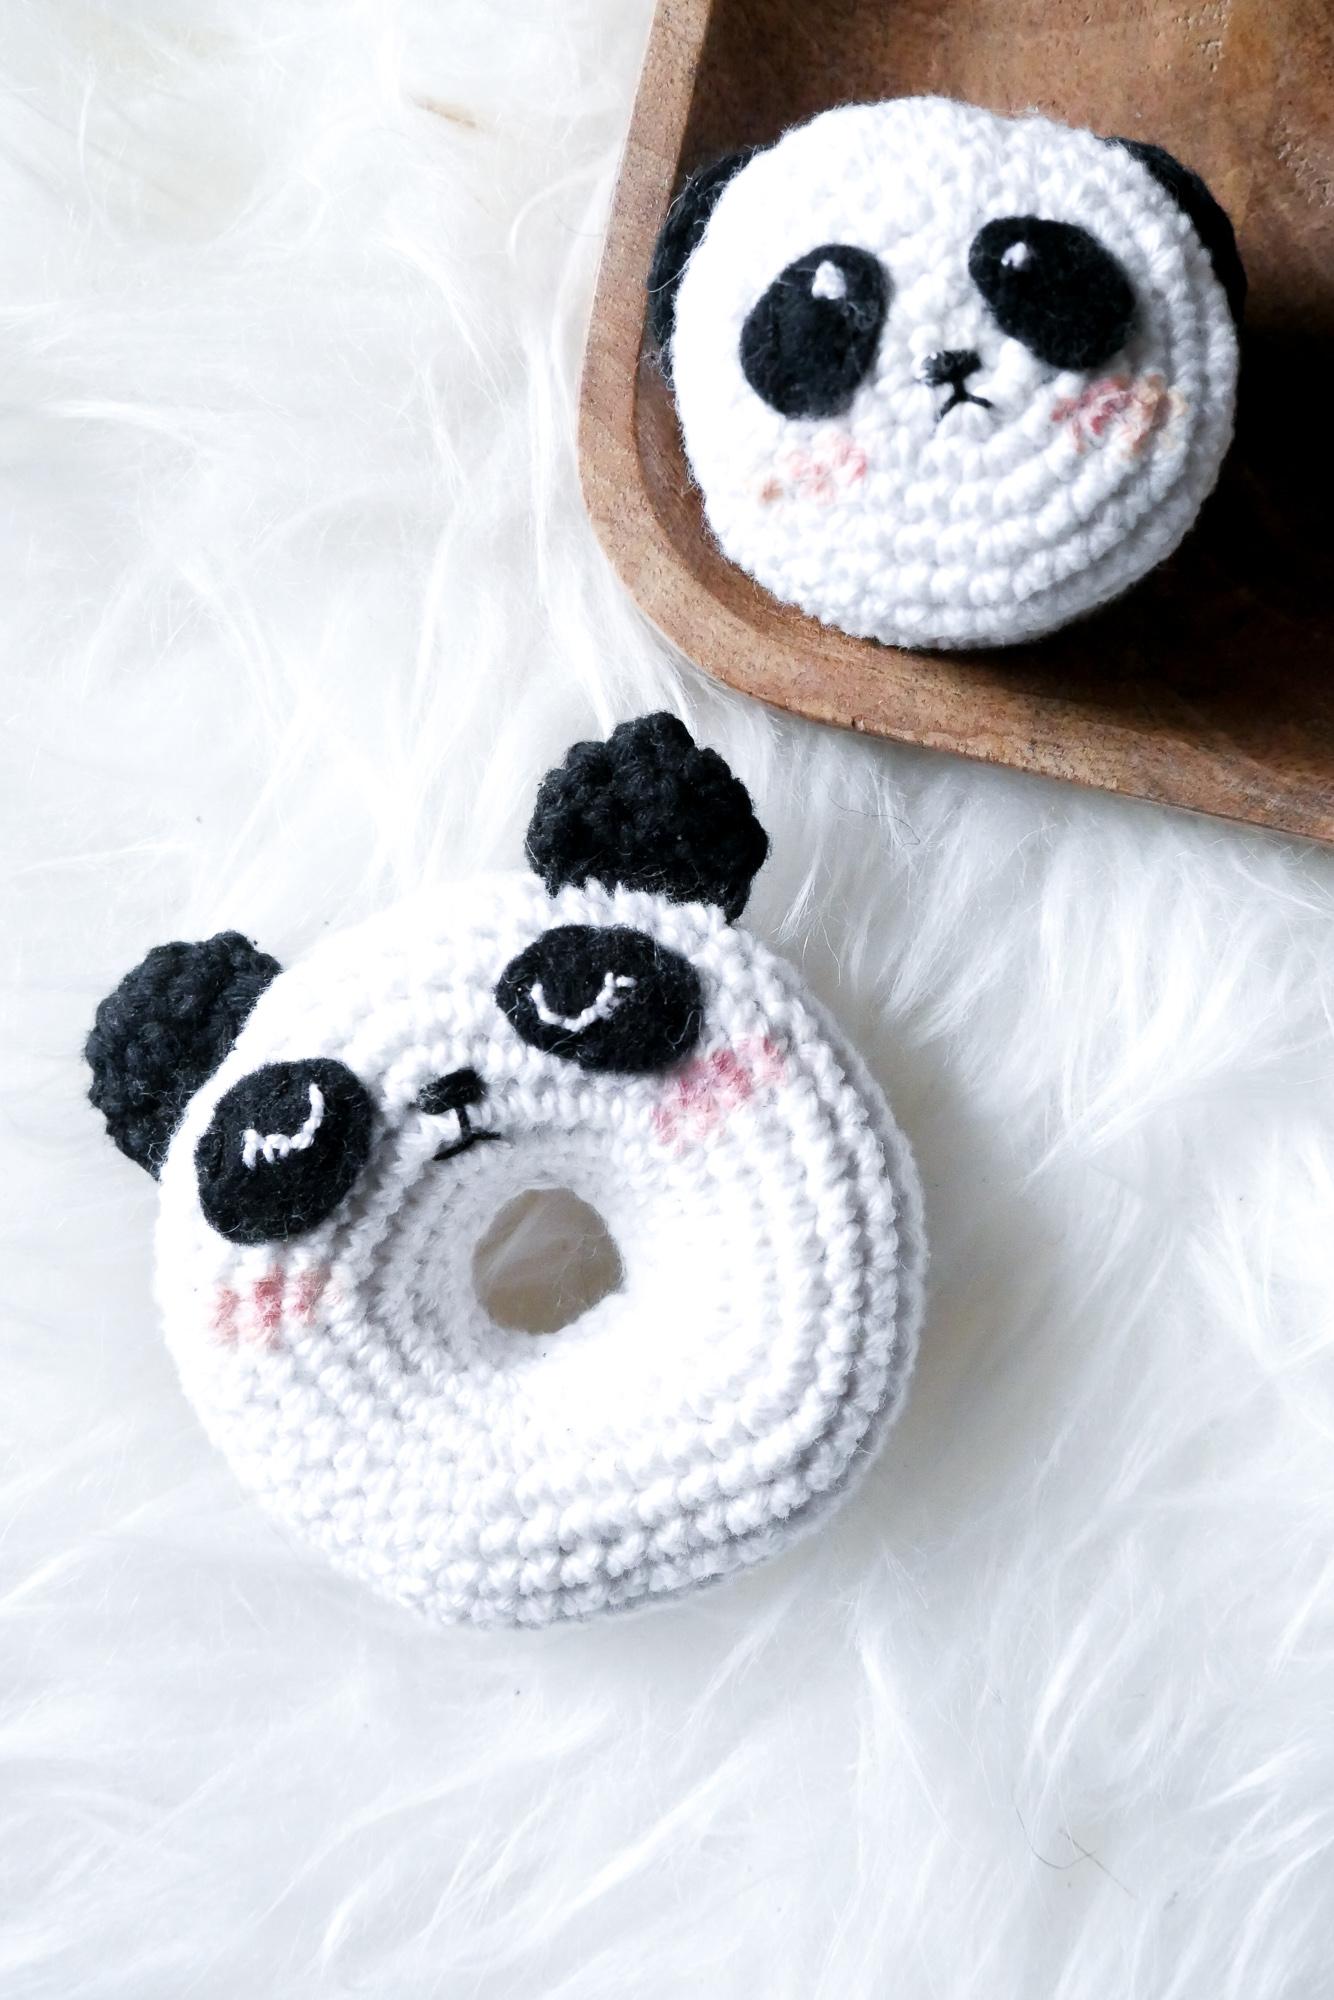 ROSA KANINCHEN AMIGURUMI Crochet Kit Tier gefüllte Puppe Material ...   2000x1334